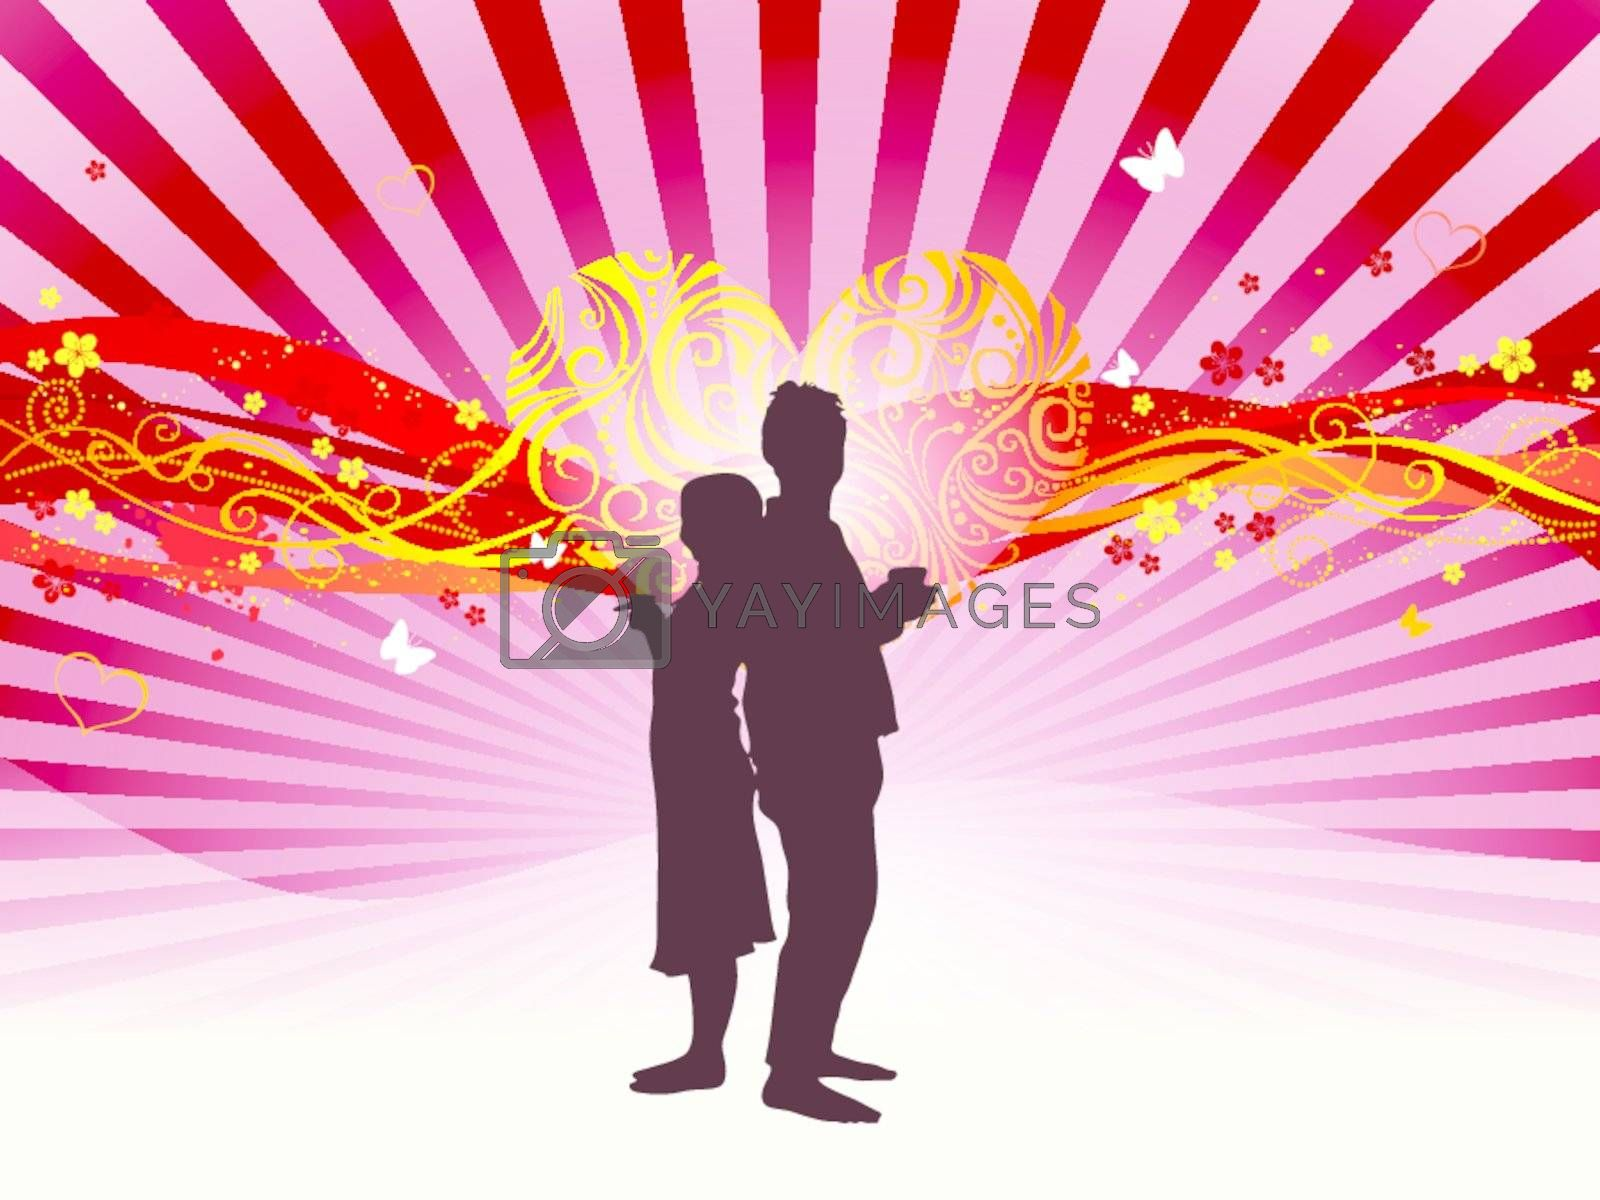 Backgrounds vector love